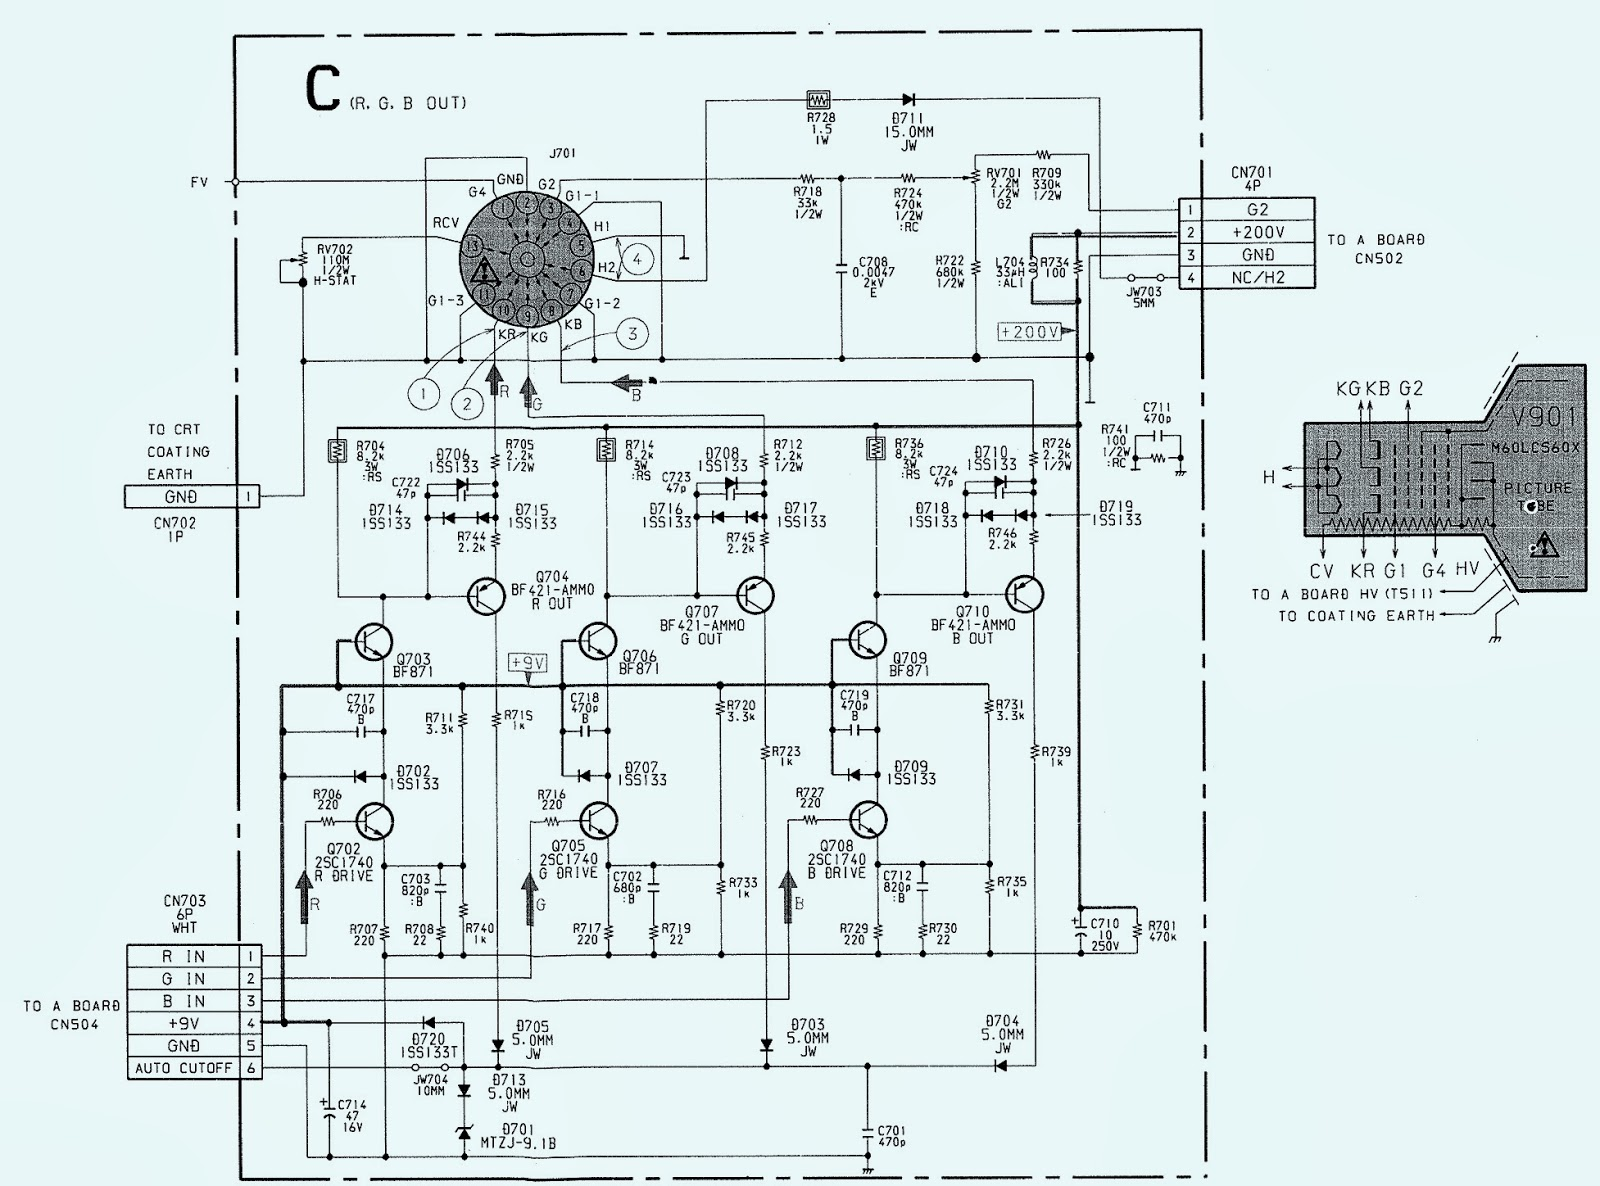 Schematic Diagram Tv Sony Trinitron: Sony kv fv trinitron